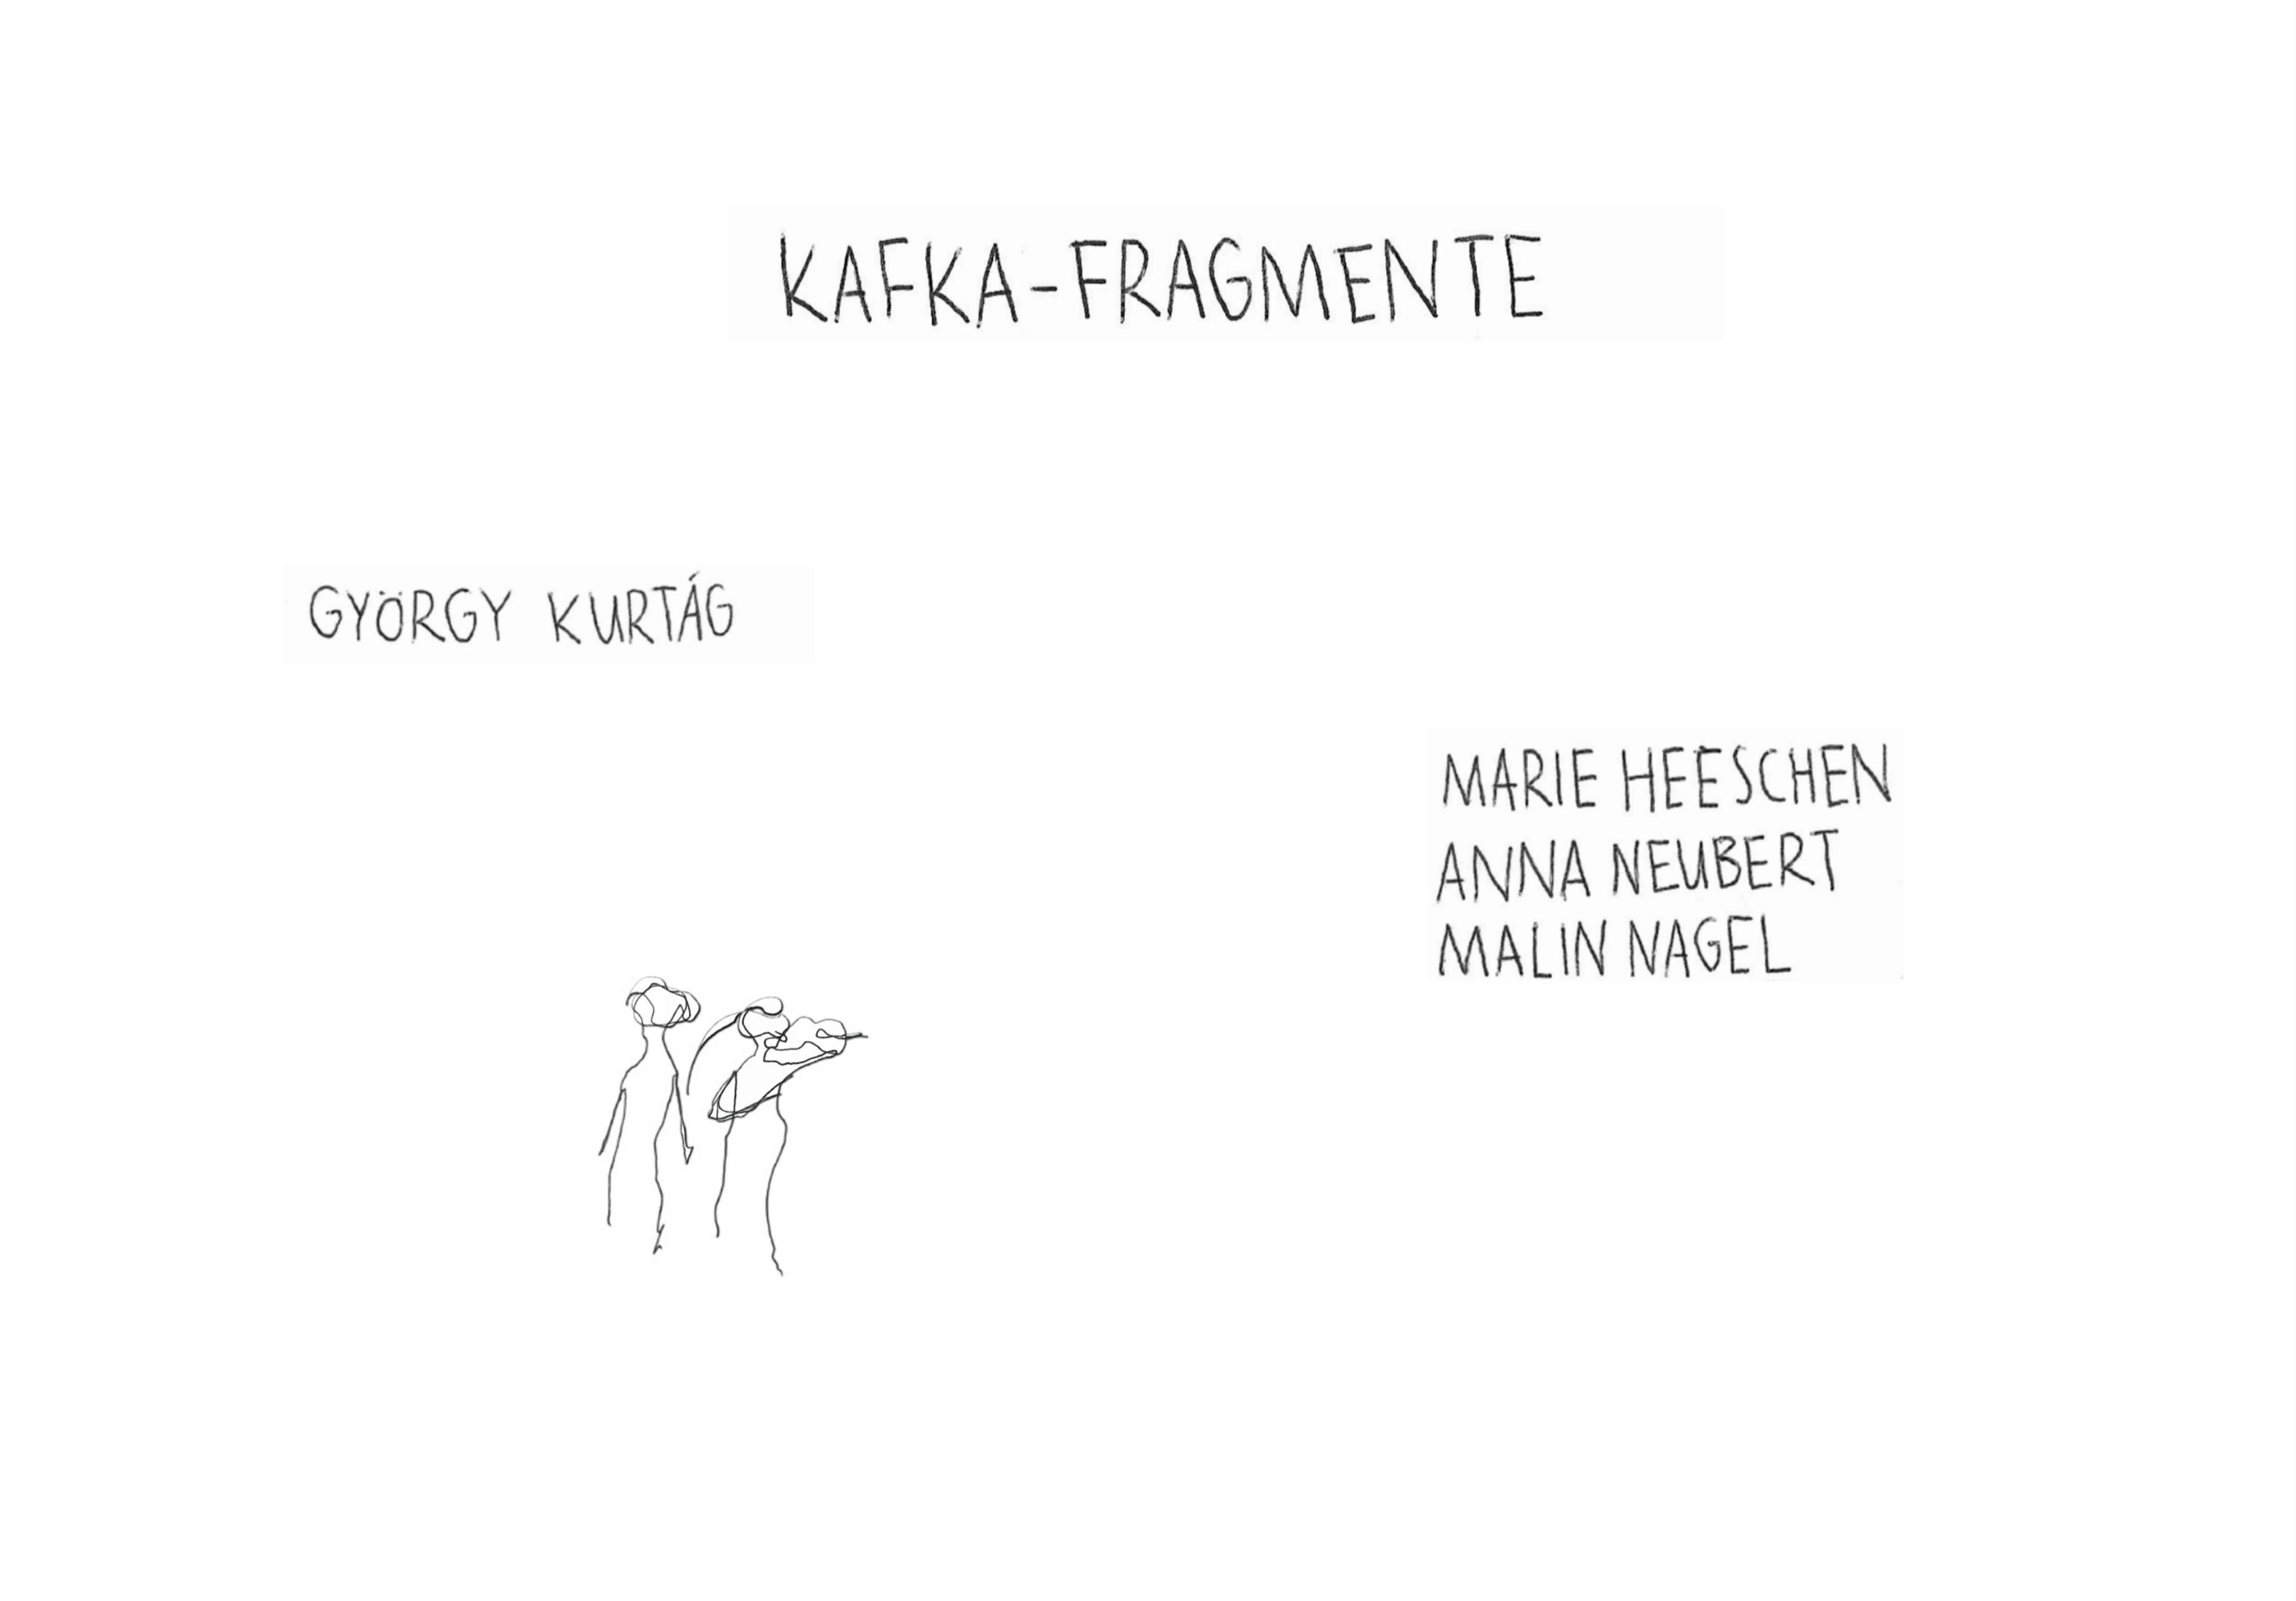 Kafka_Fragmente